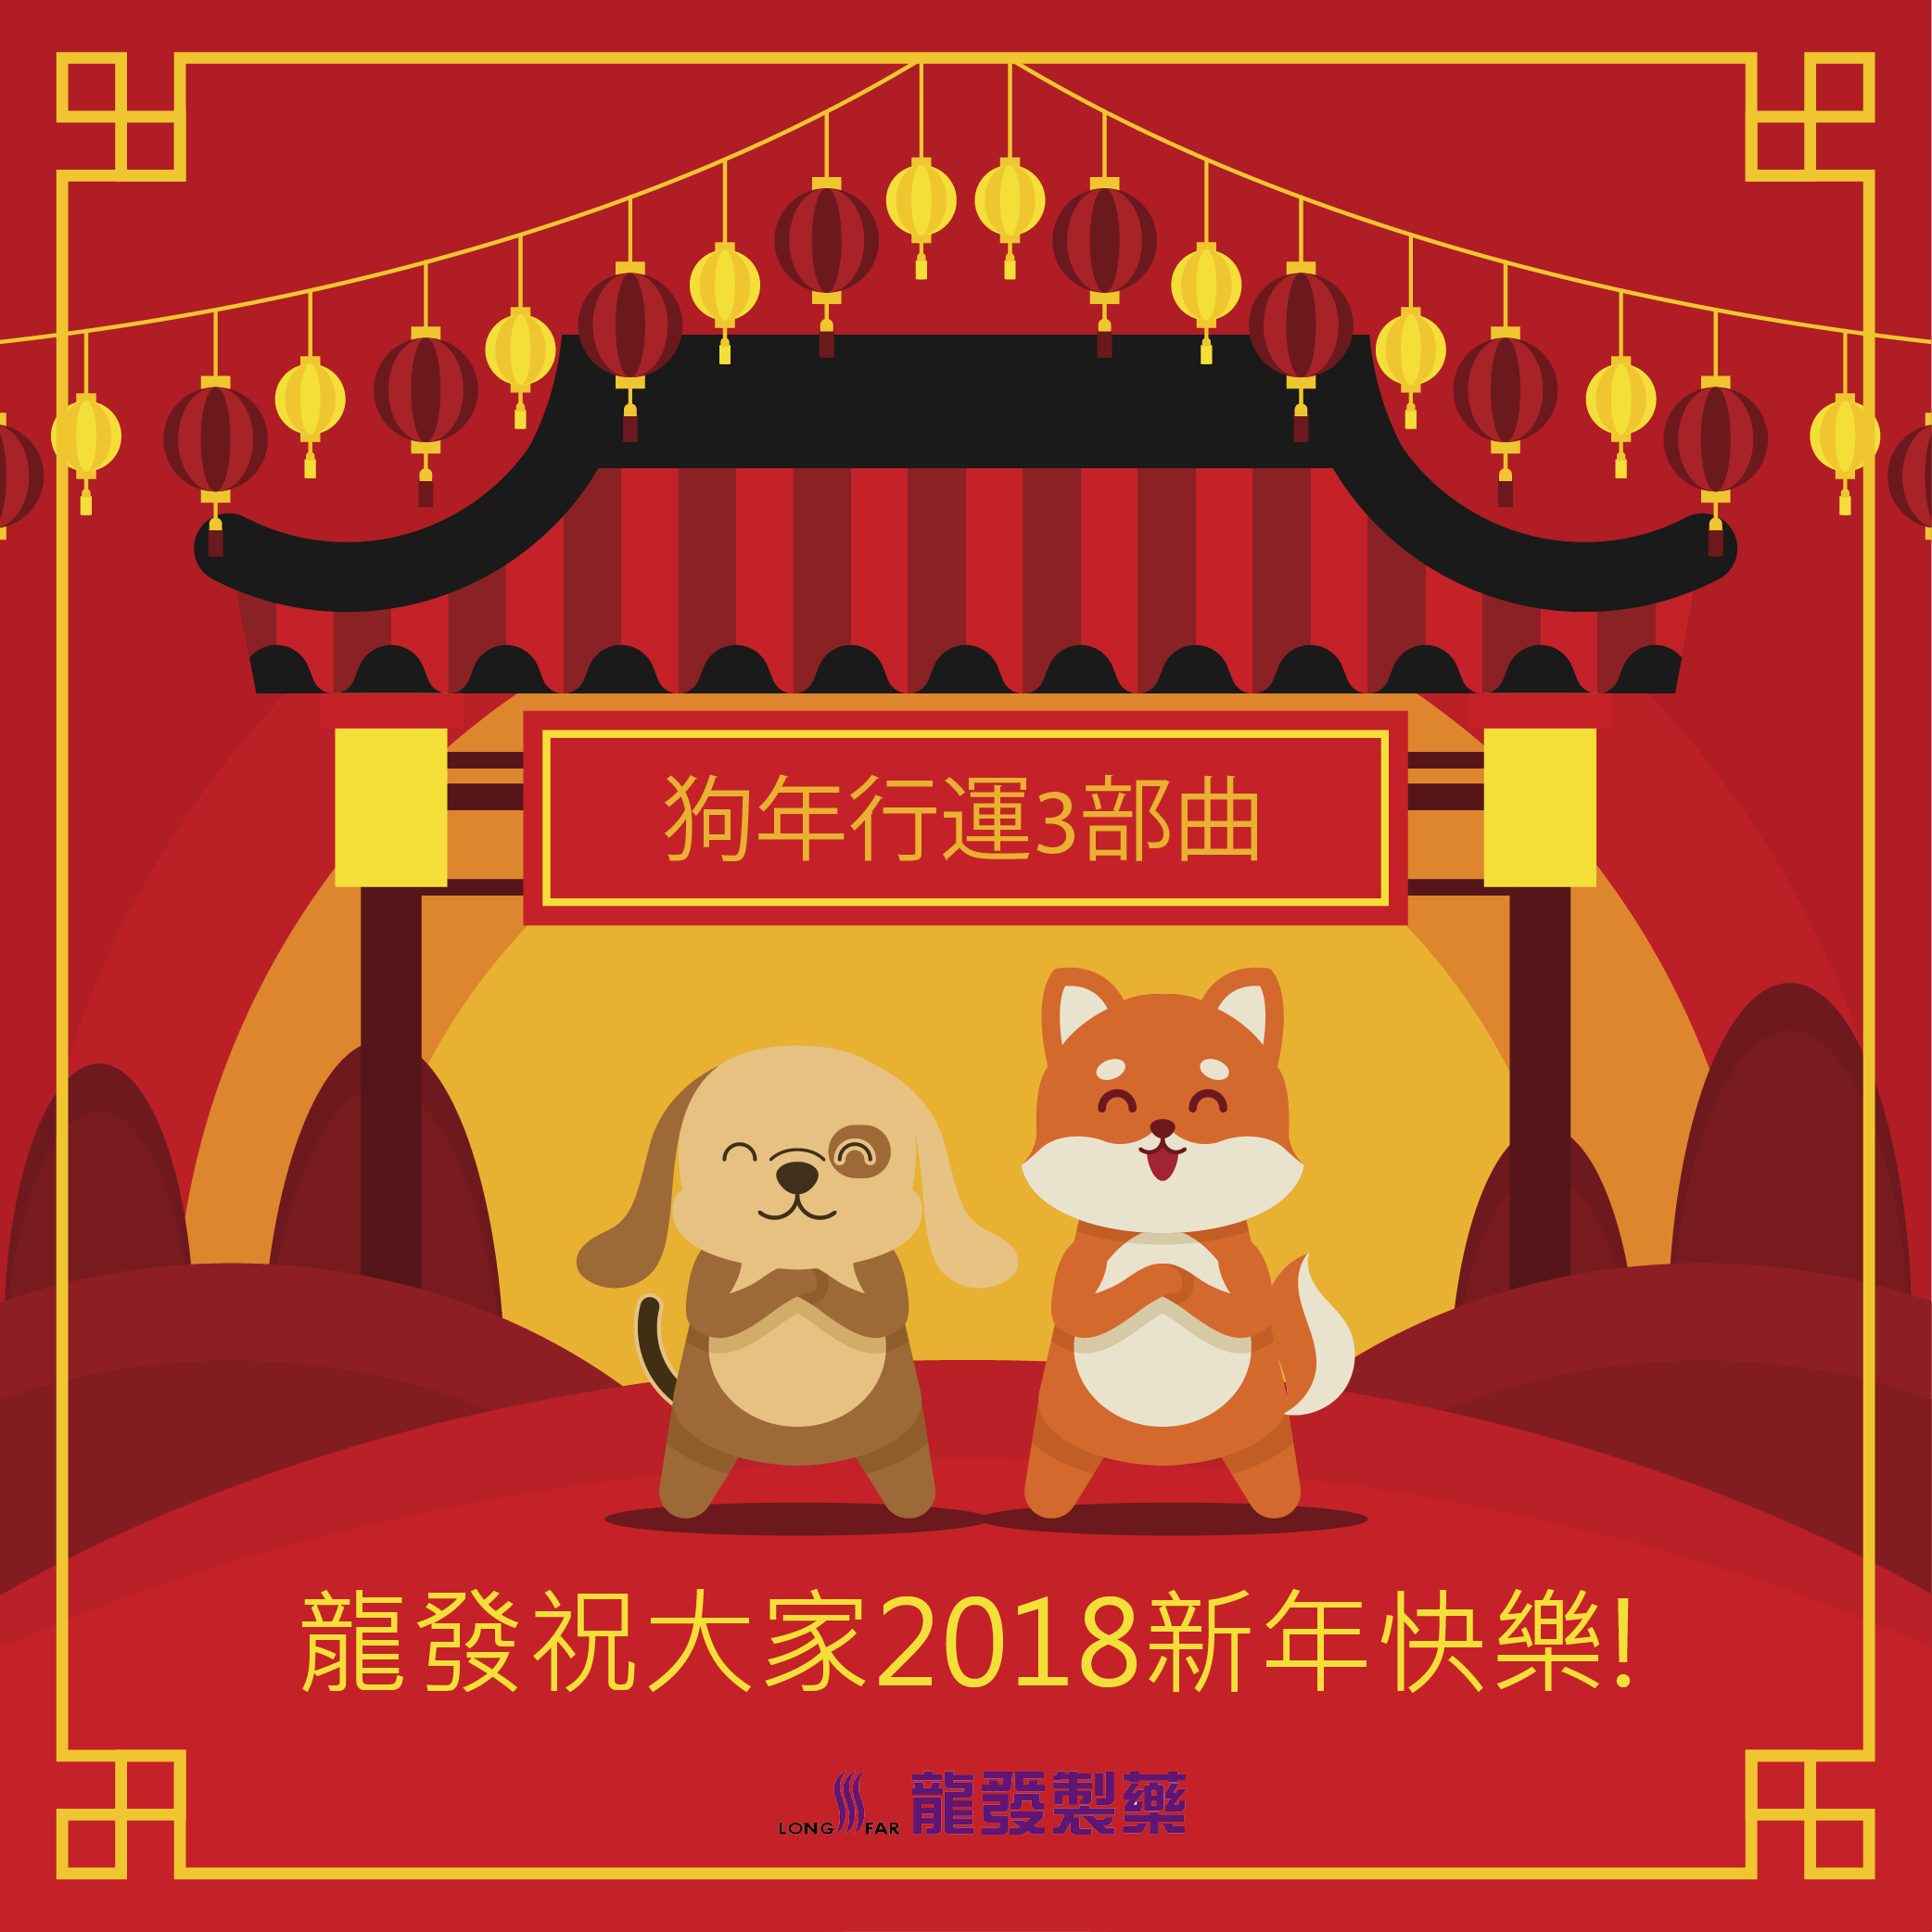 2018 Chinese Lunar Year Promotion (Longfar member only)